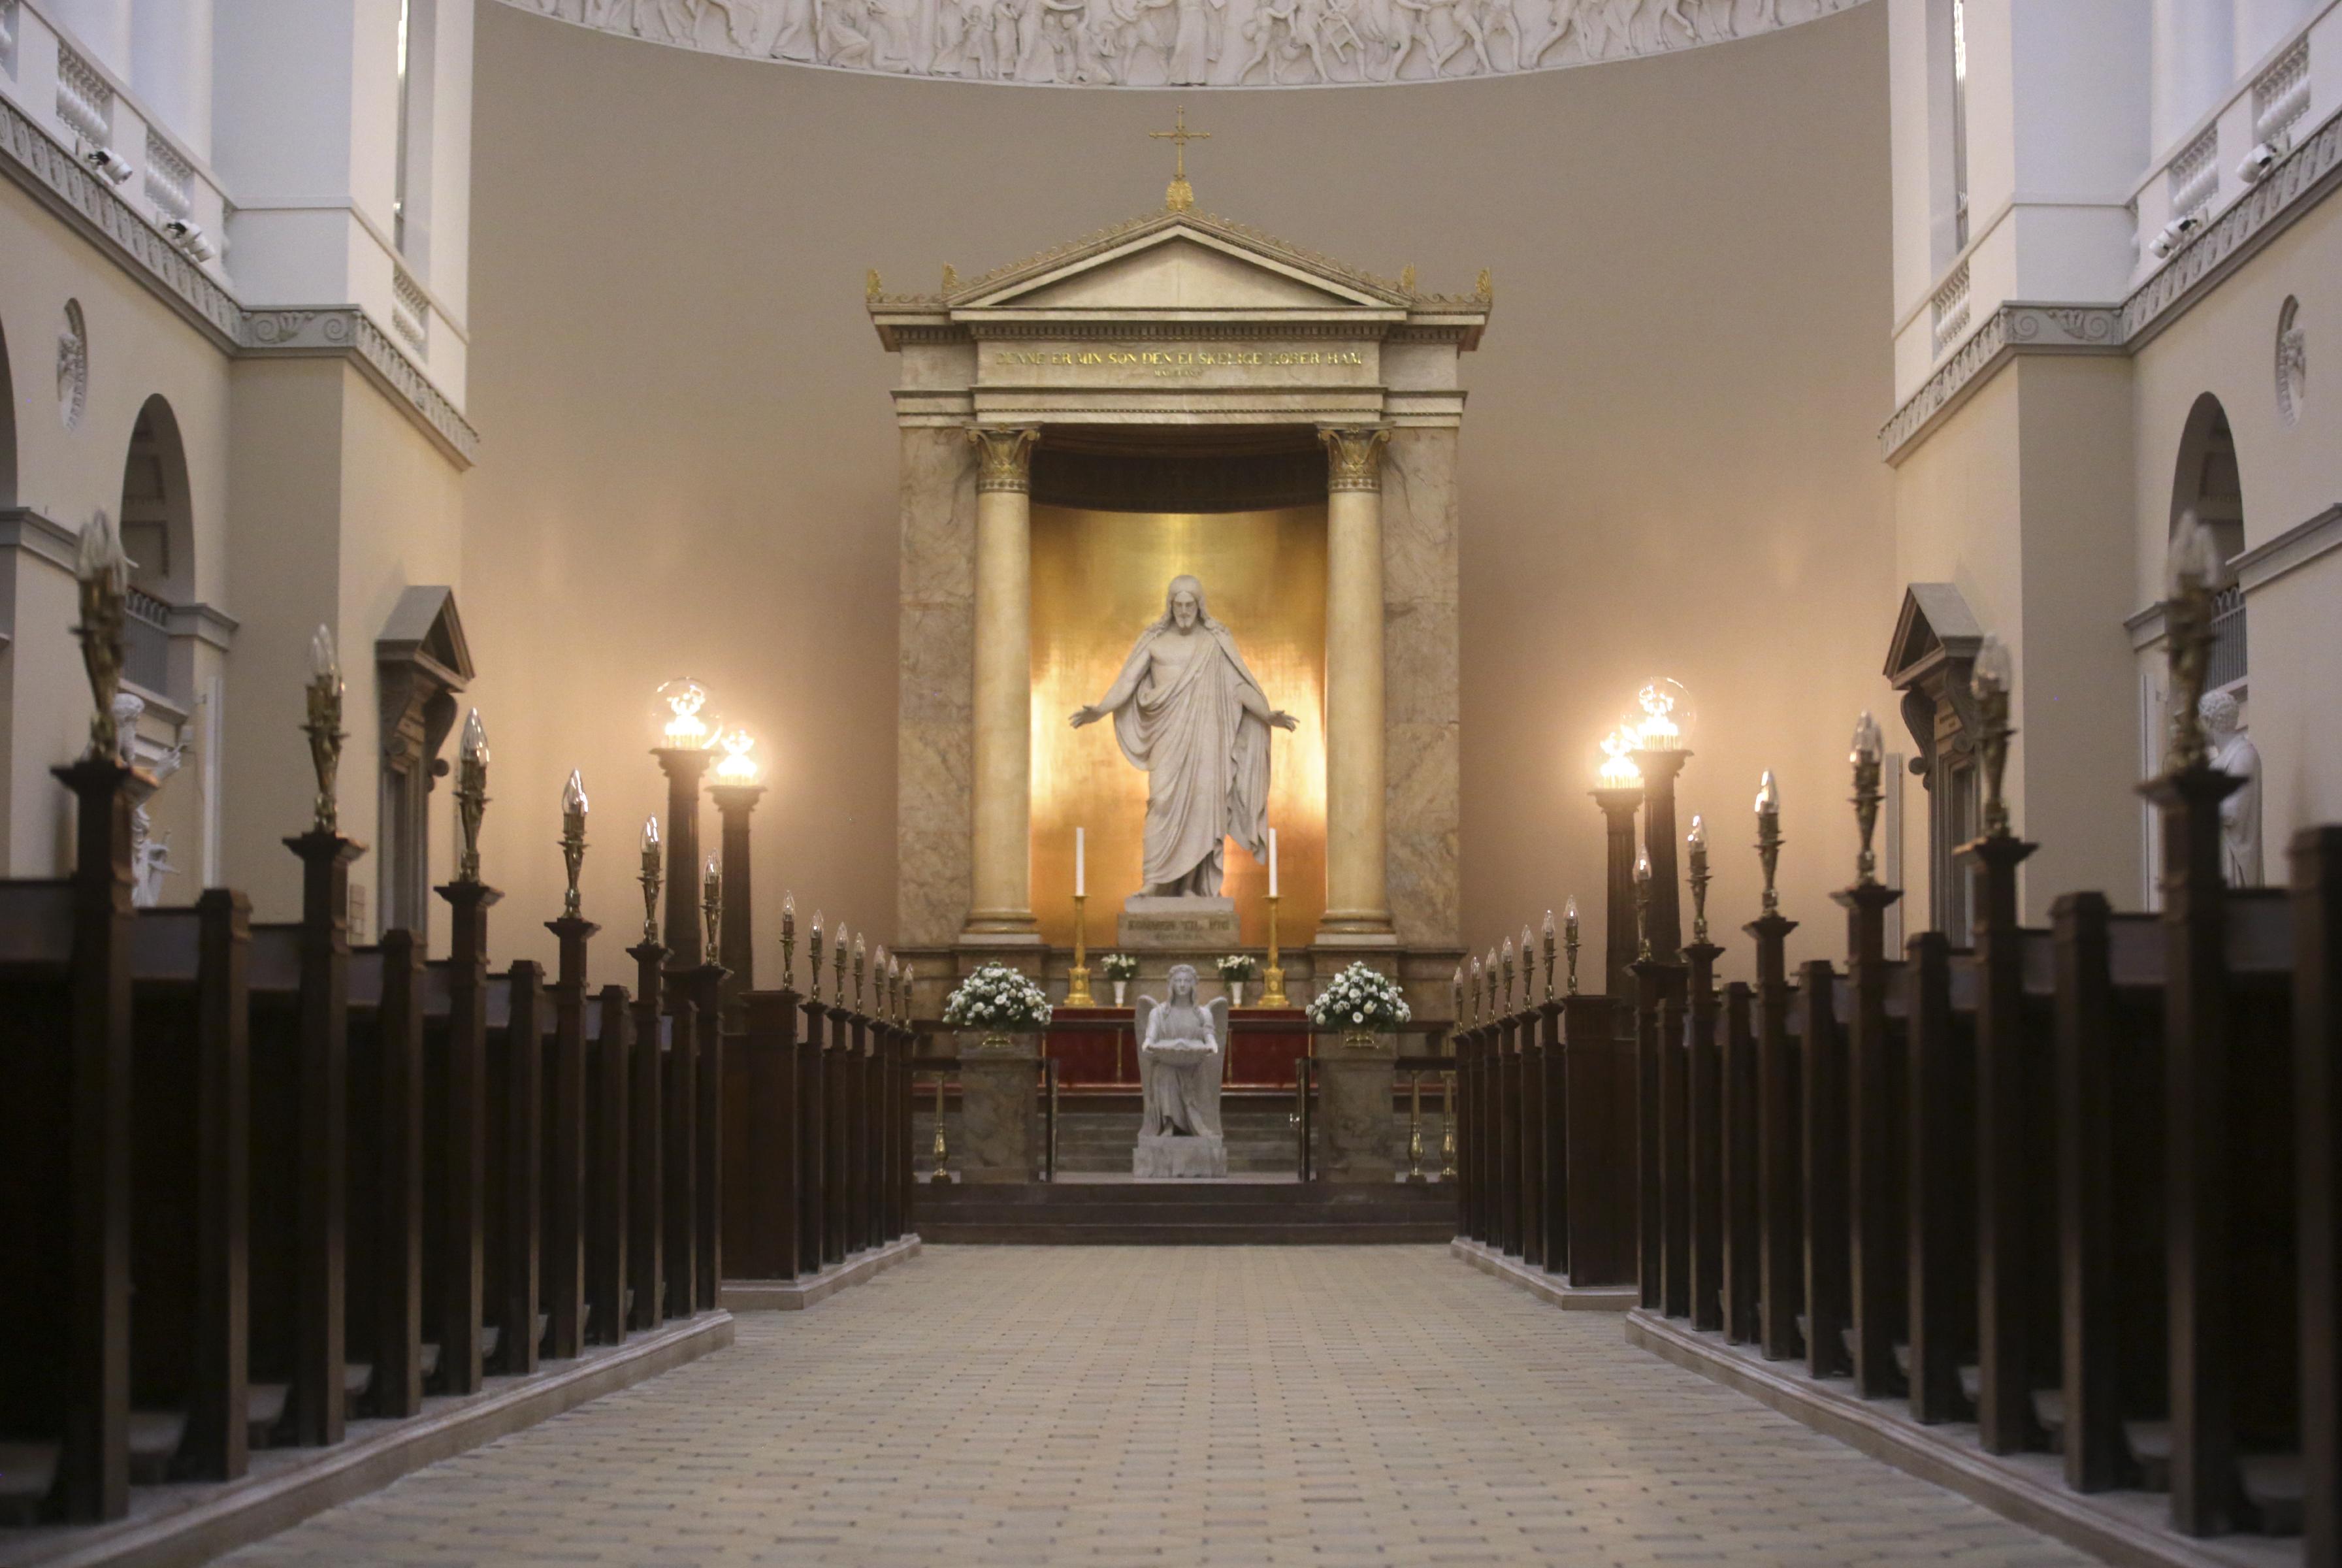 Bertel Thorvaldsen's Christus statue is the focal point of the Church of Our Lady in Copenhagen, Denmark, on Tuesday, Nov. 13, 2018.